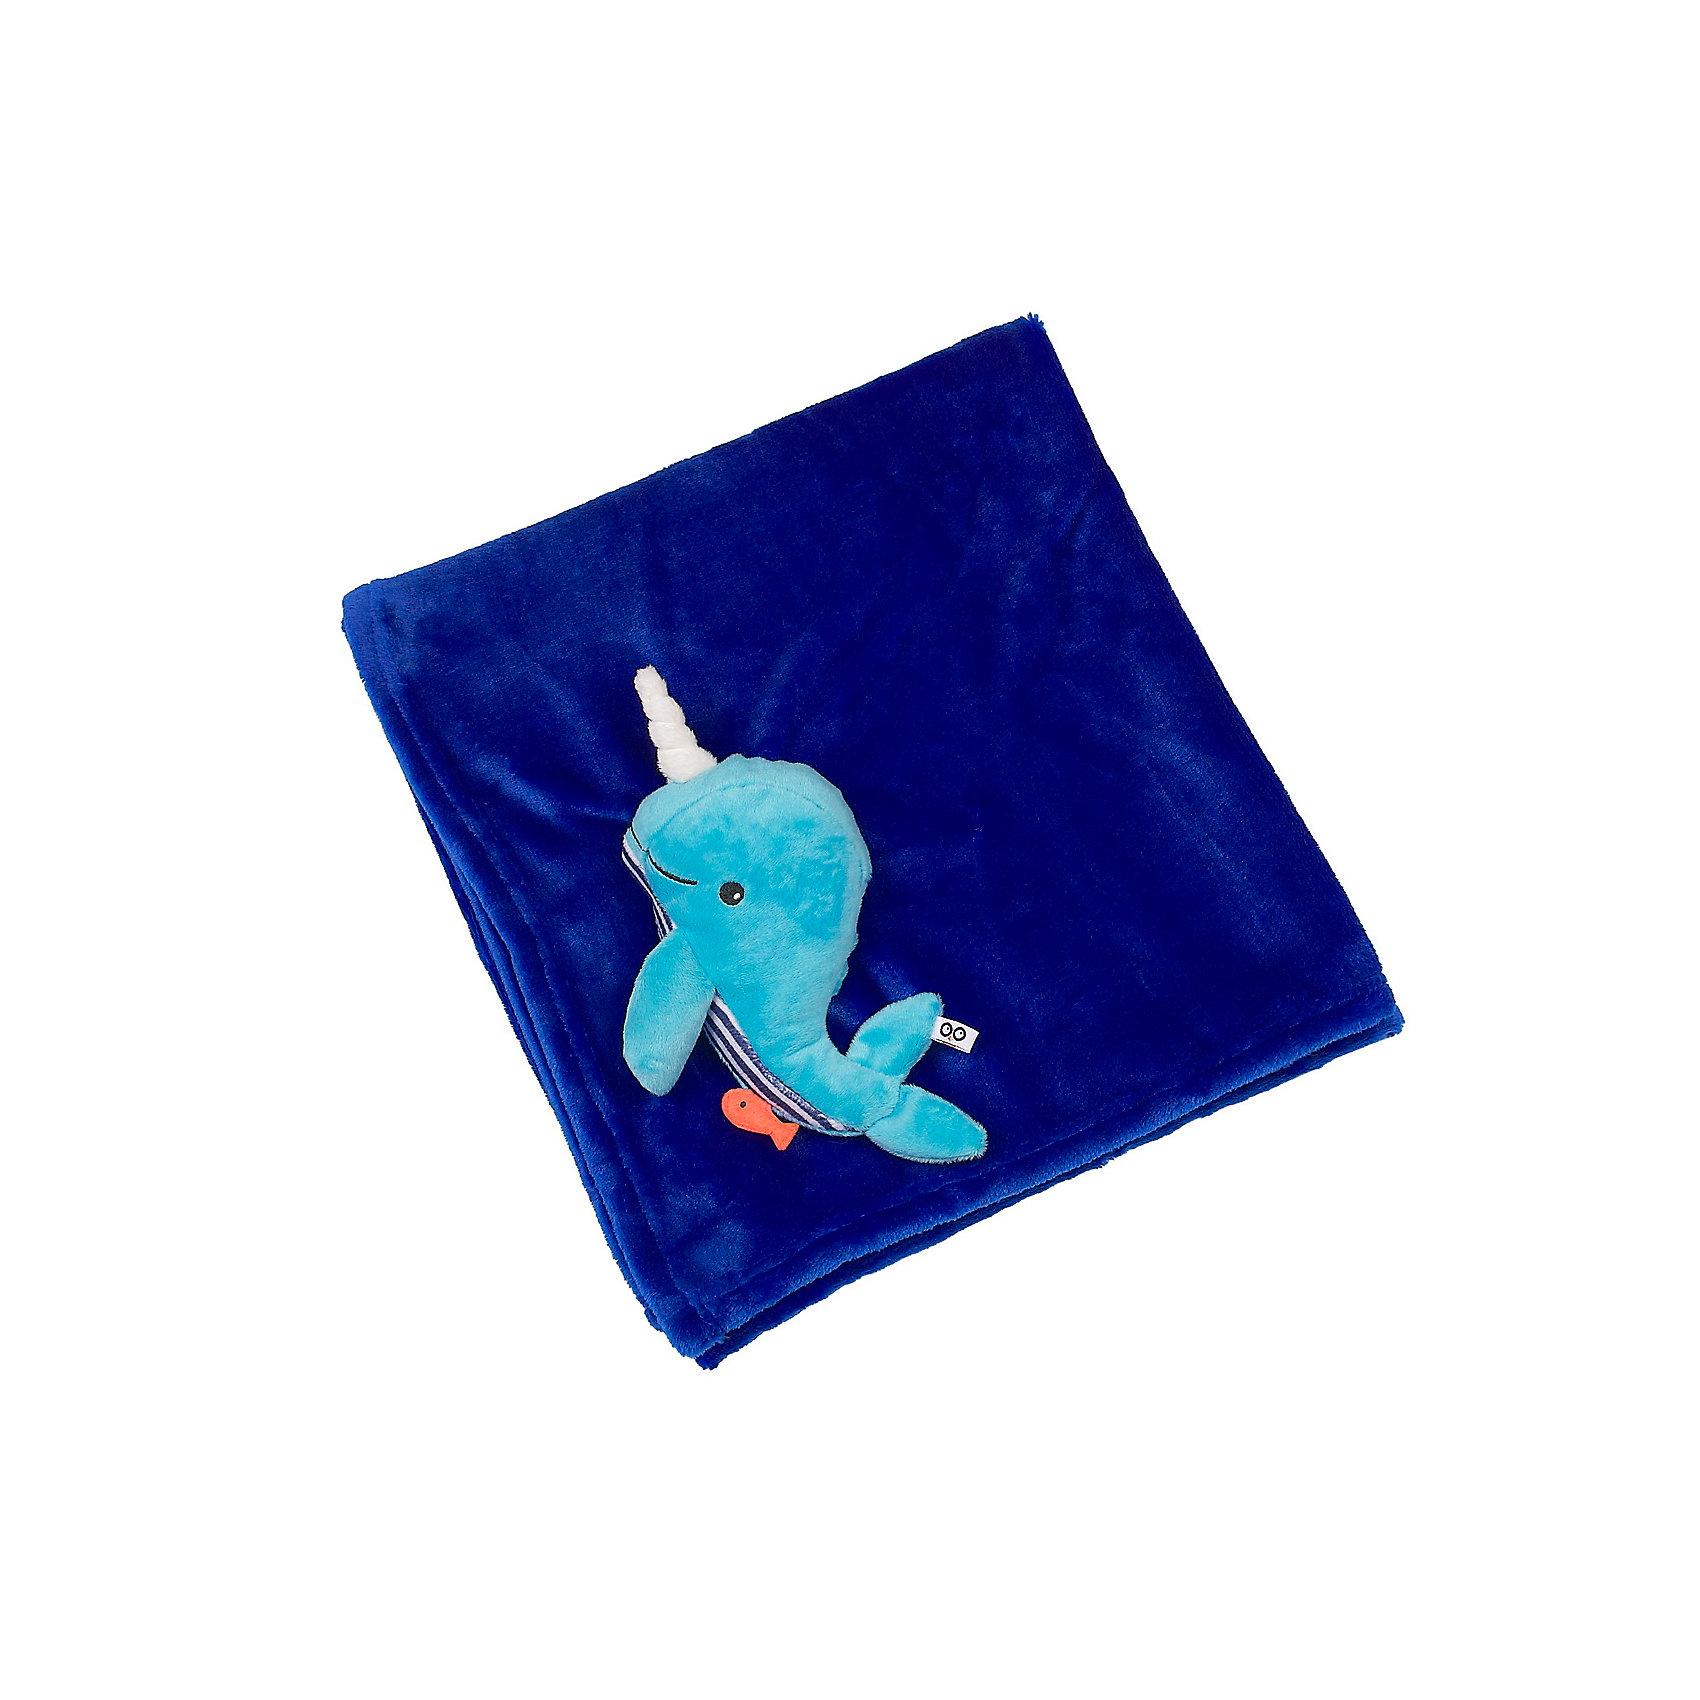 Zoocchini Одеяло с игрушкой Кит, Zoocchini, синий